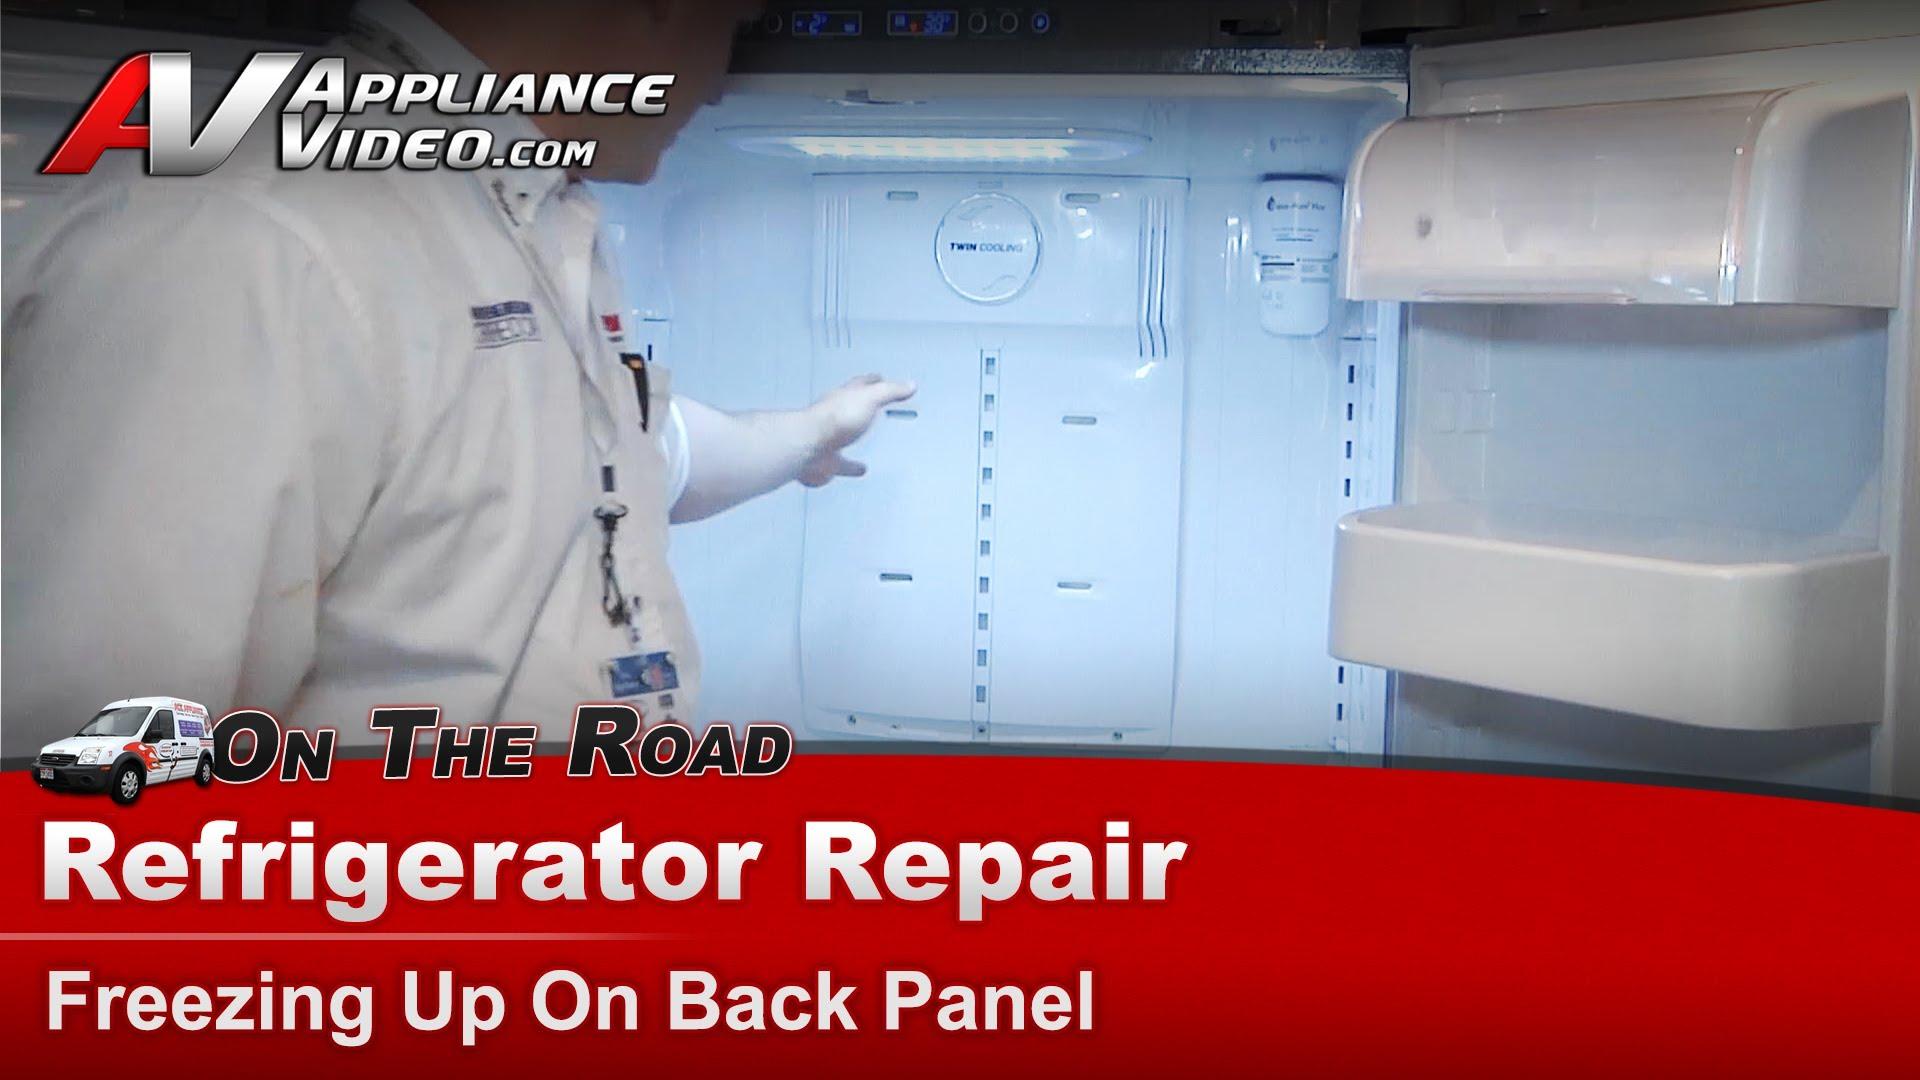 Samsung Rf266aepn Refrigerator Repair Not Cooling